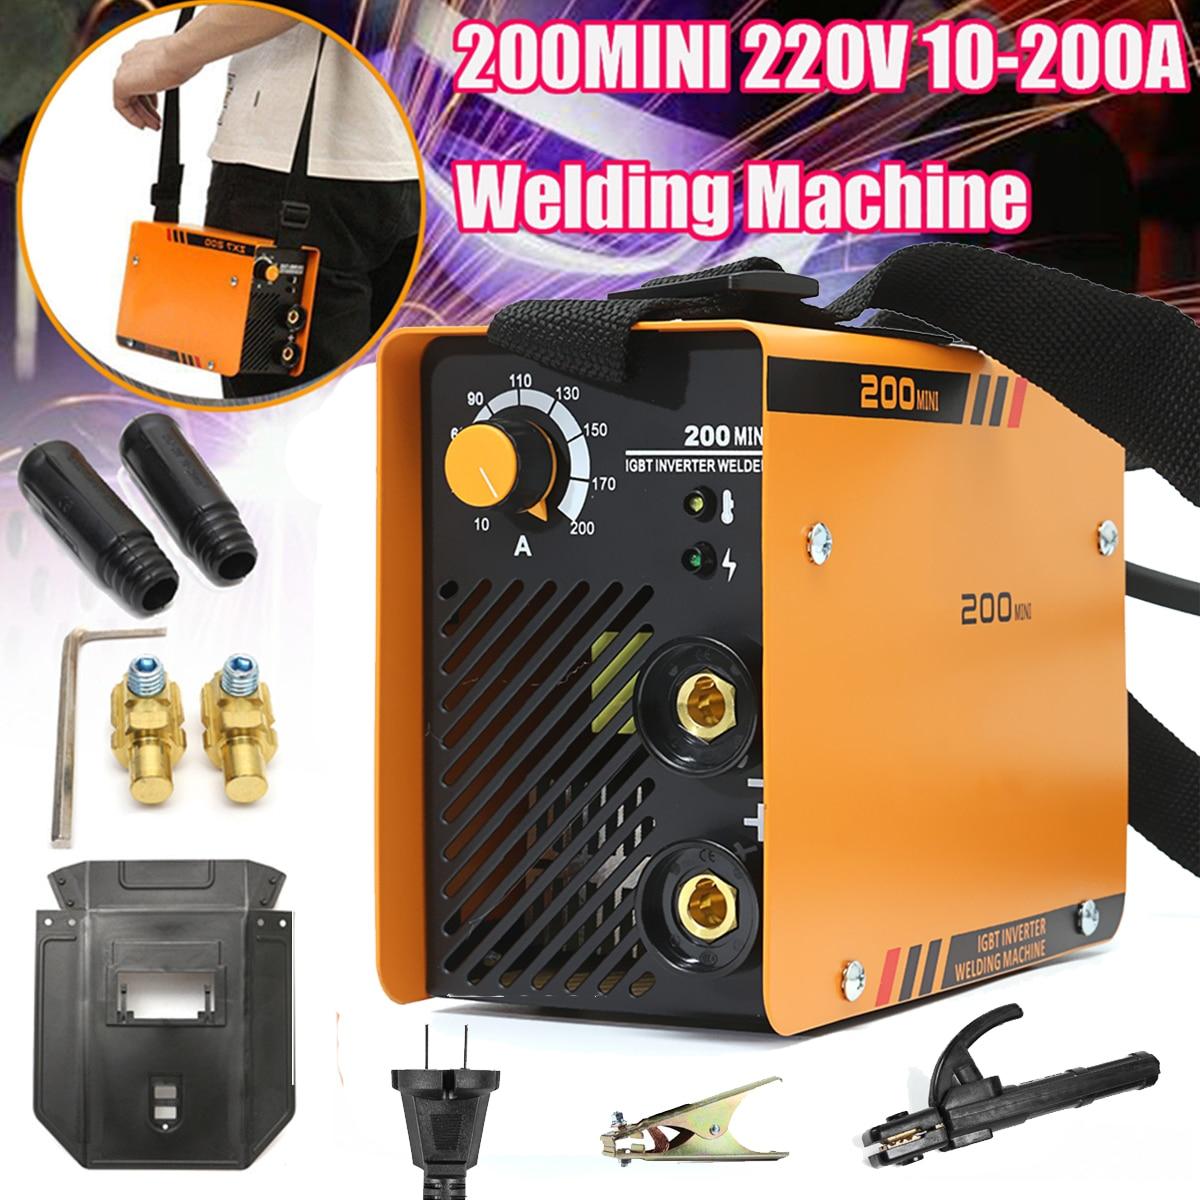 ZX7-200MINI 220 kW Mini MMA eléctrico V 10-200A inversor arco herramienta de soldadura de alta calidad